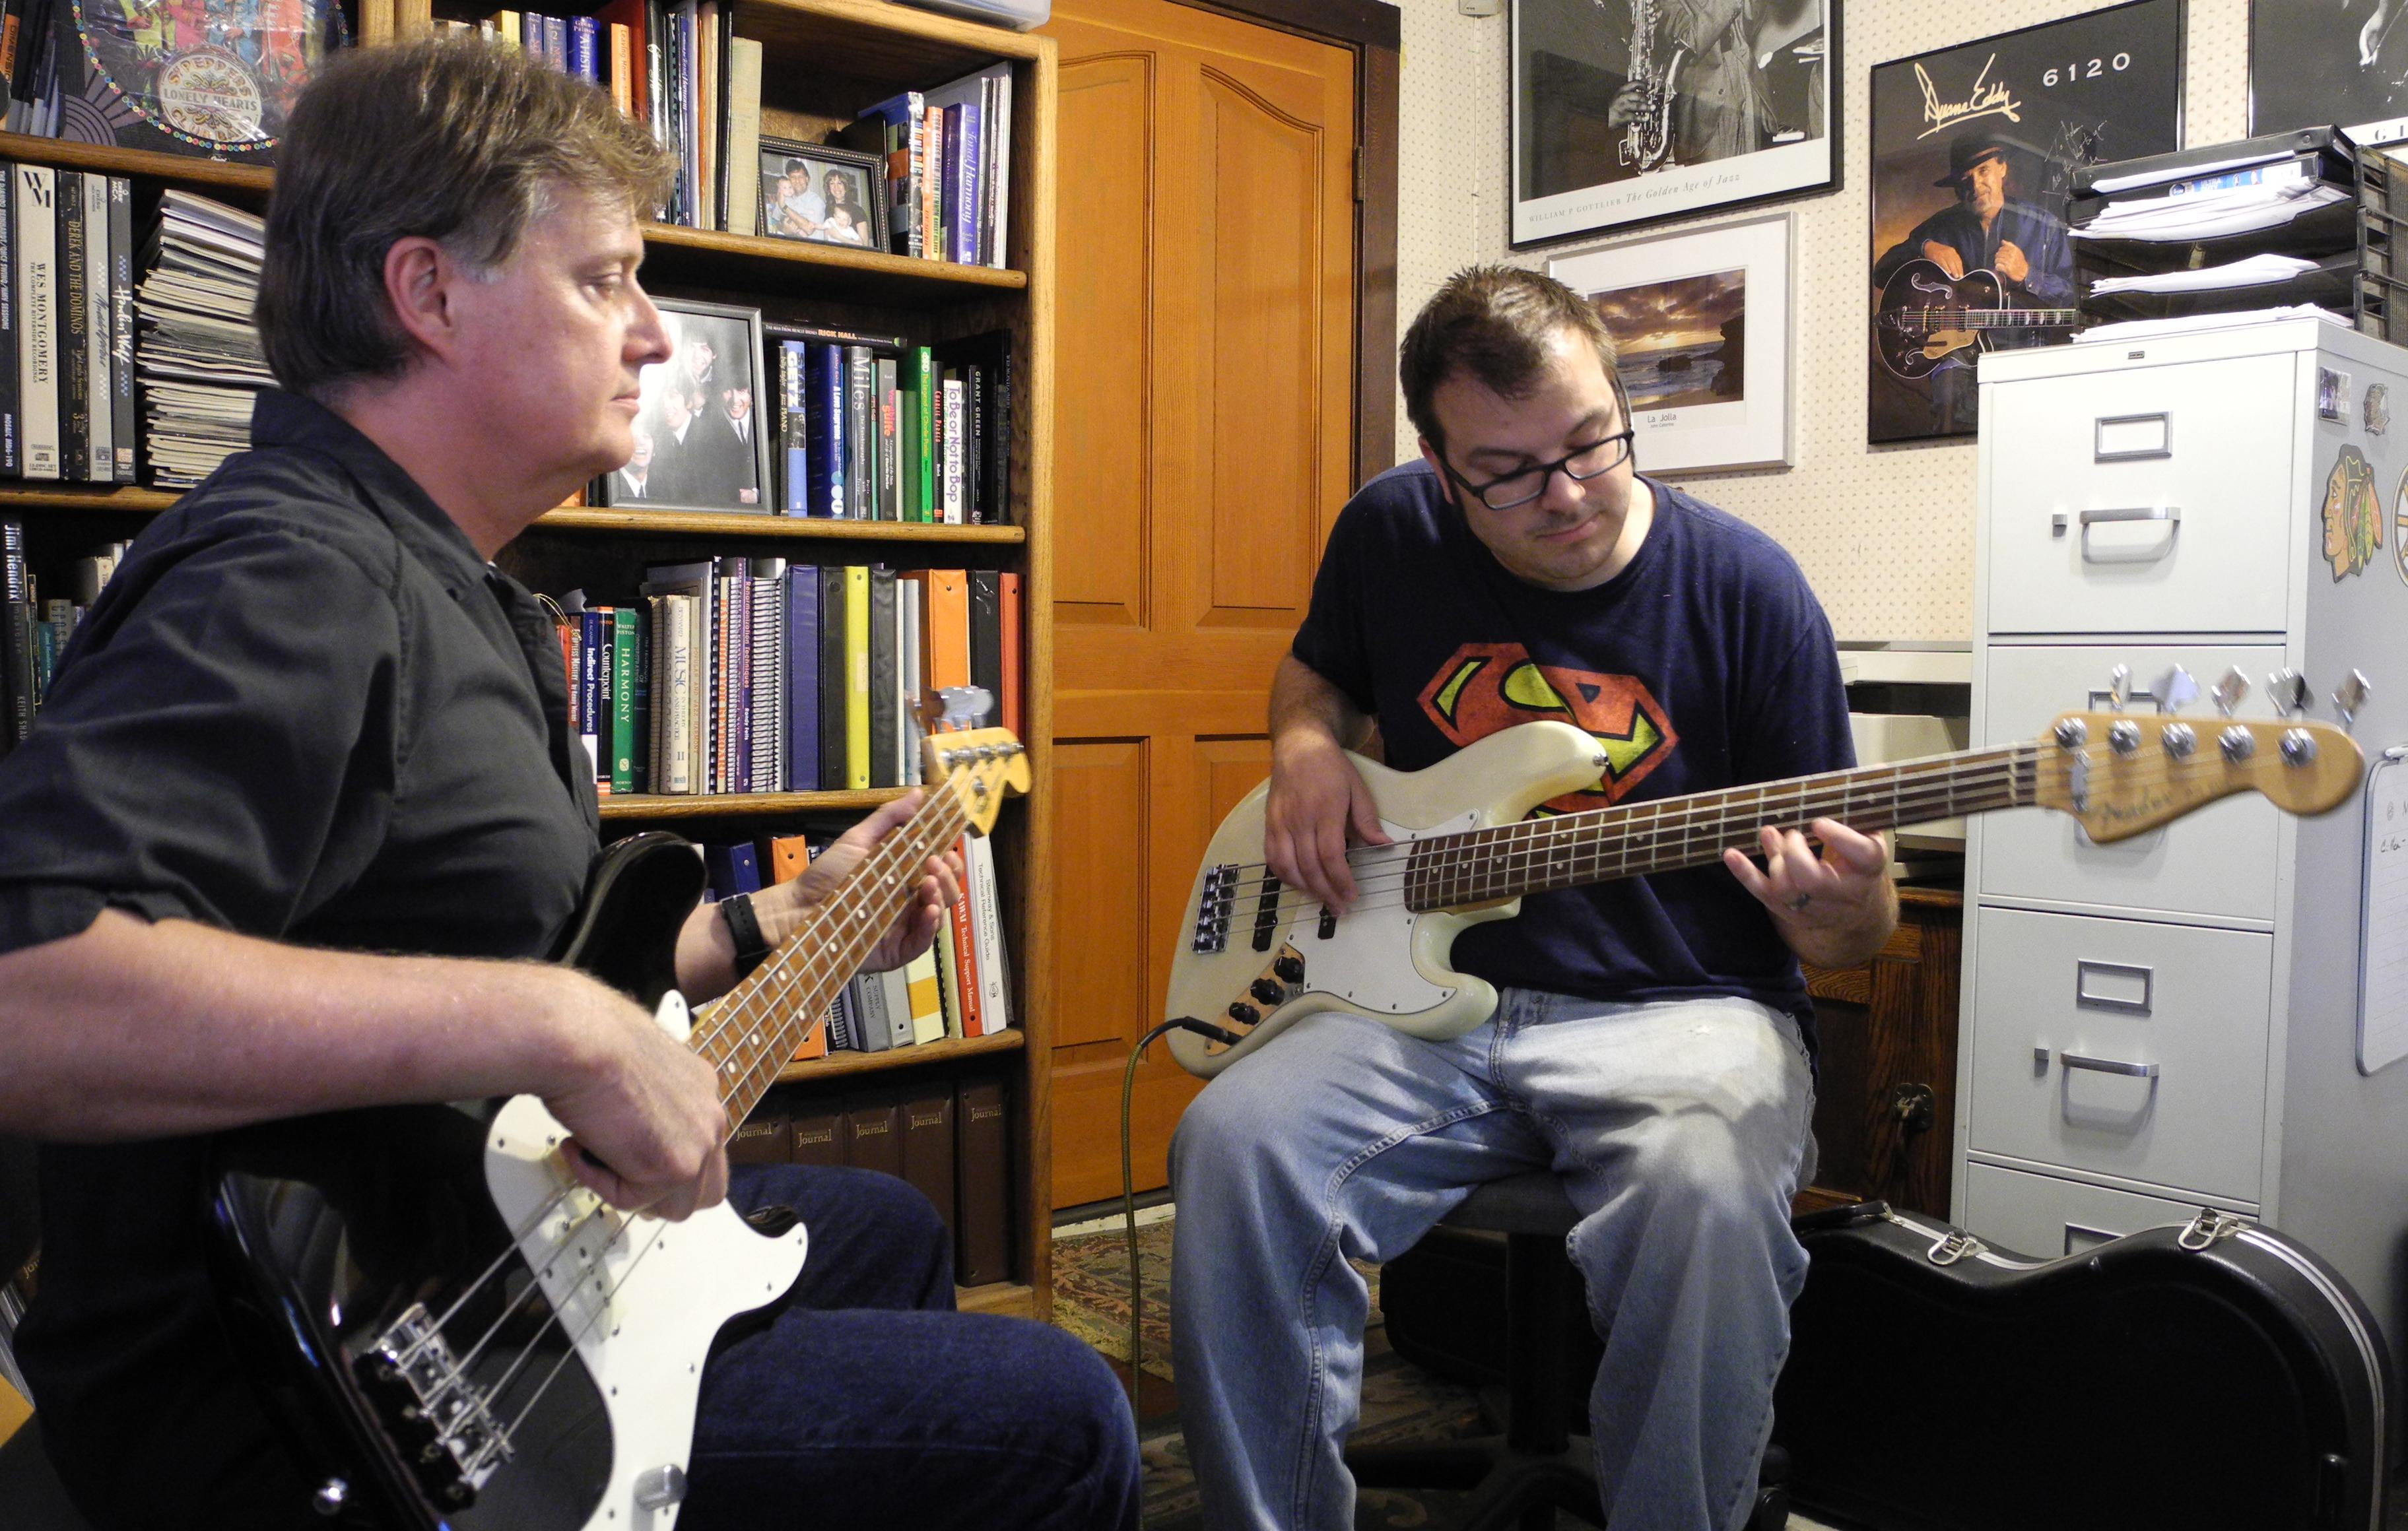 John caterino music west covina california ca for Yamaha music school los angeles